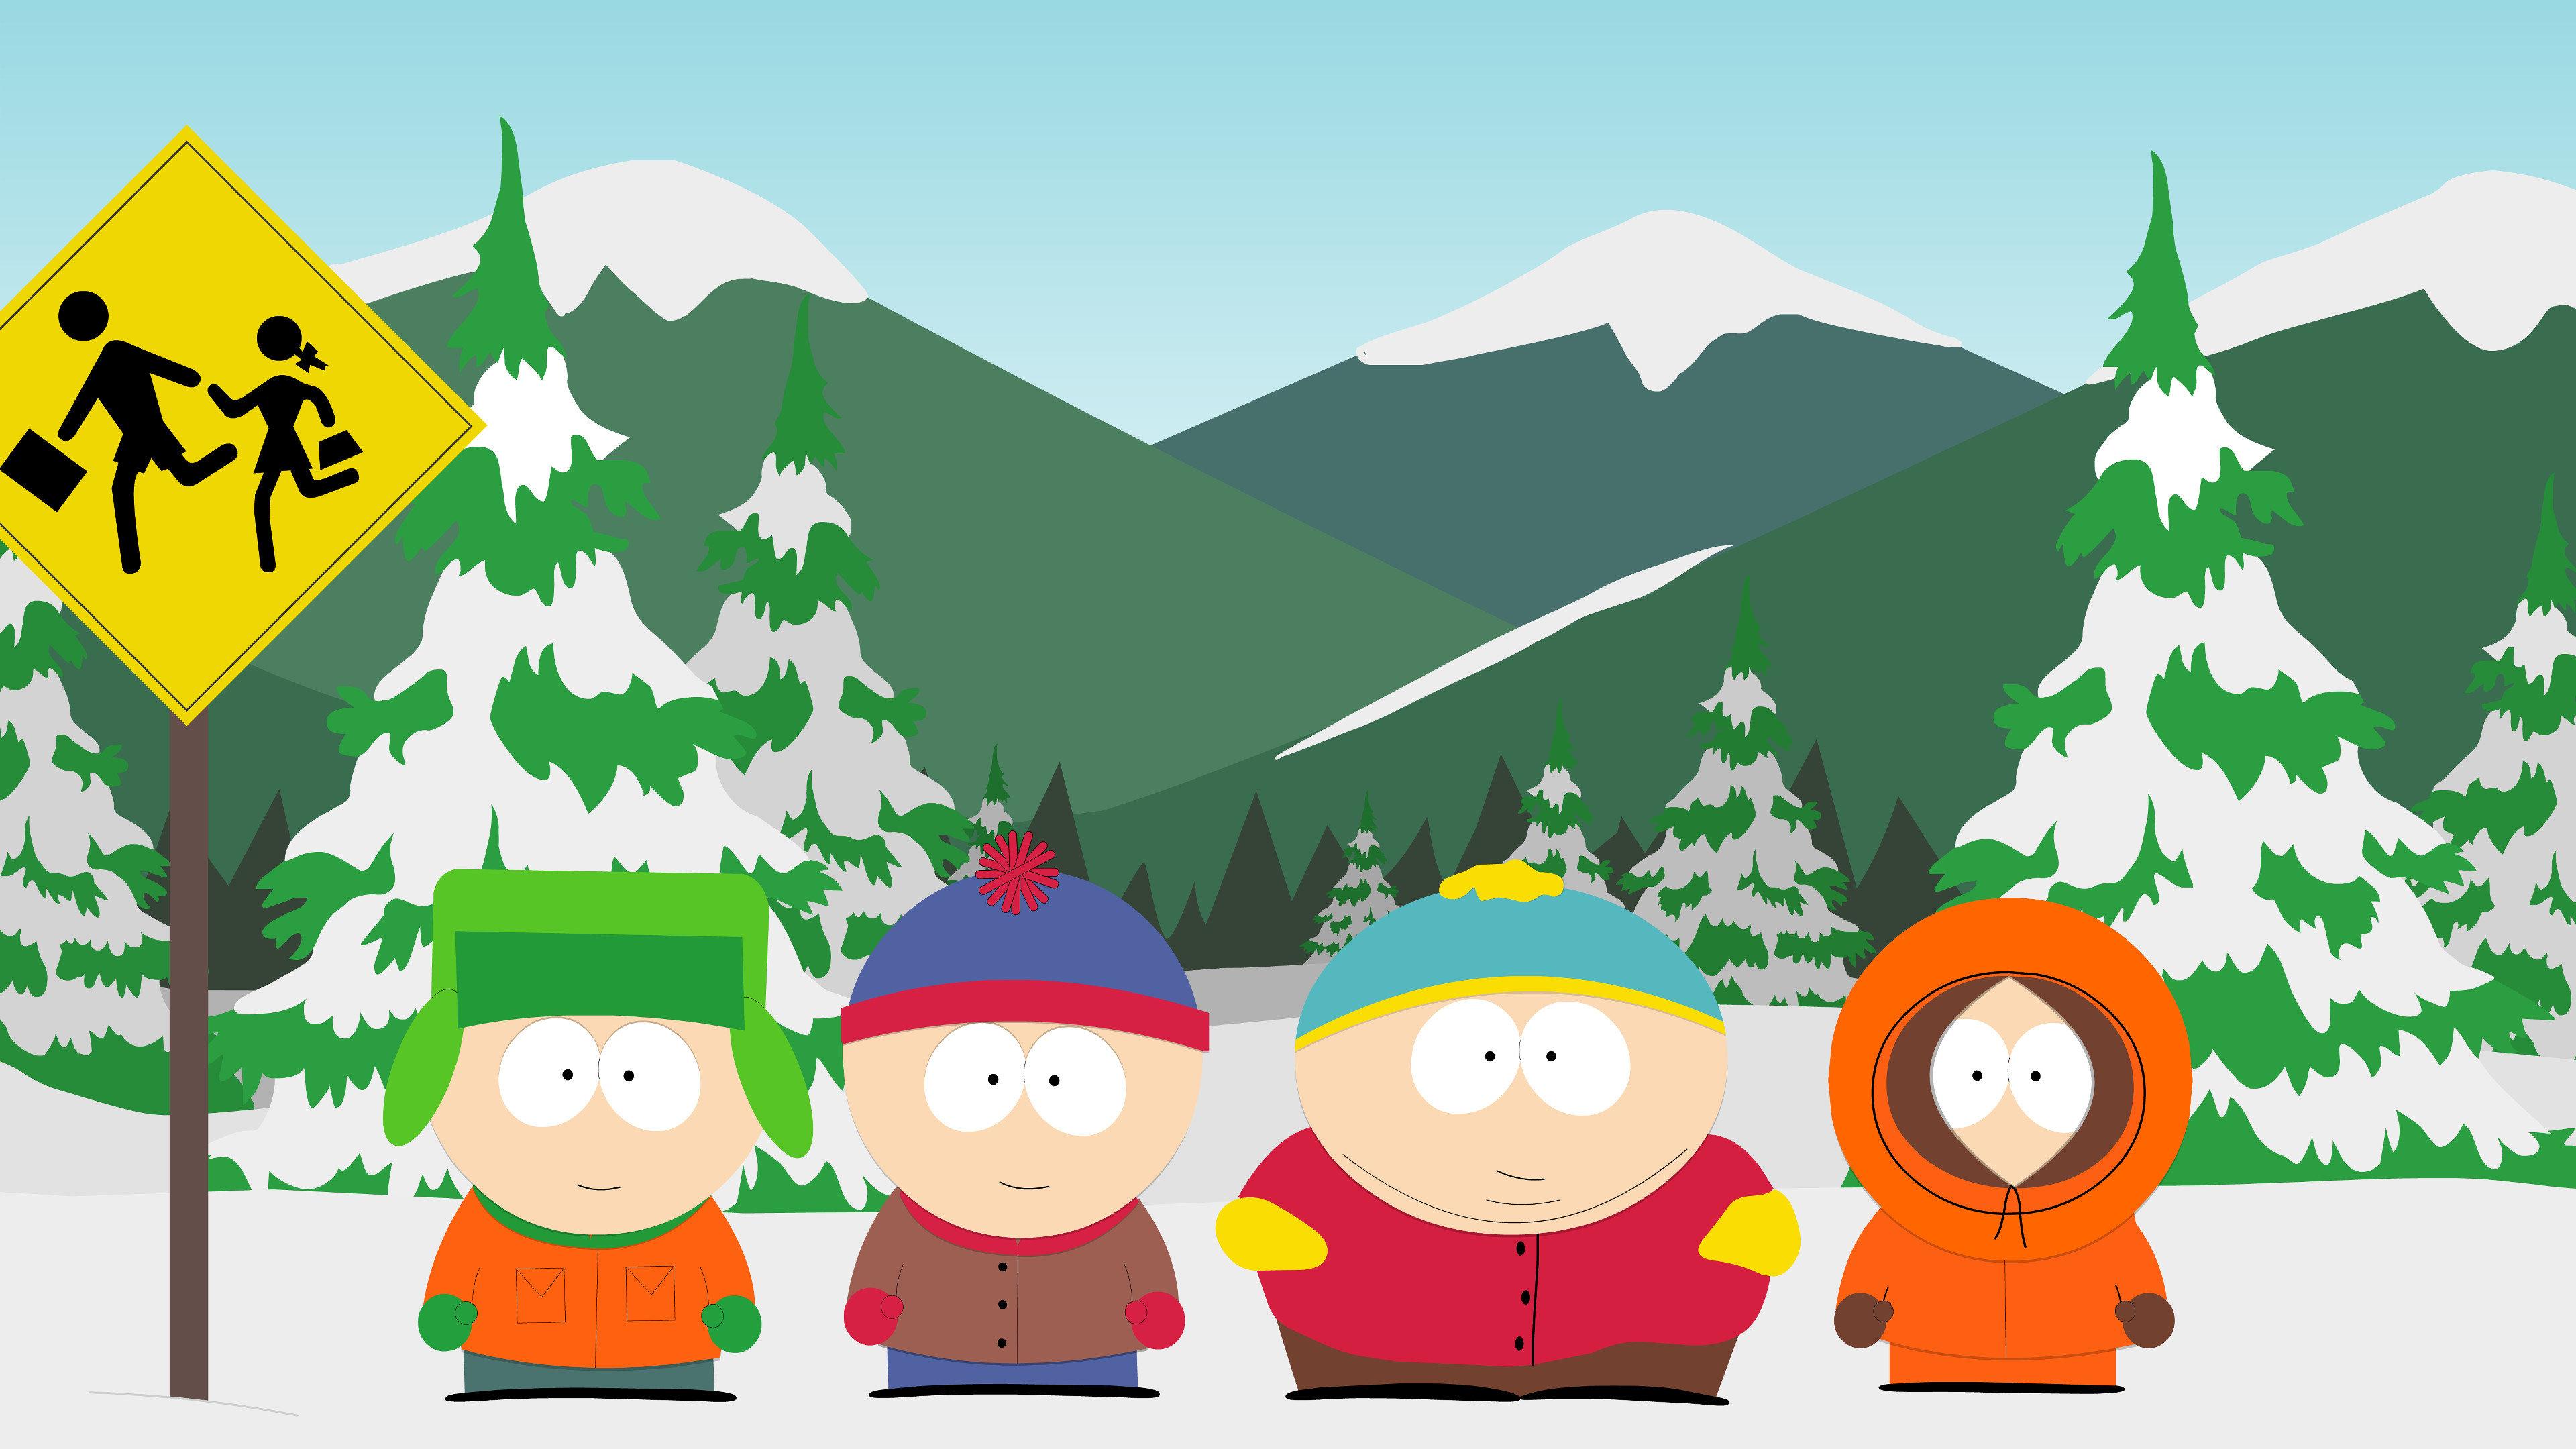 South Park Wallpapers Hd For Desktop Backgrounds